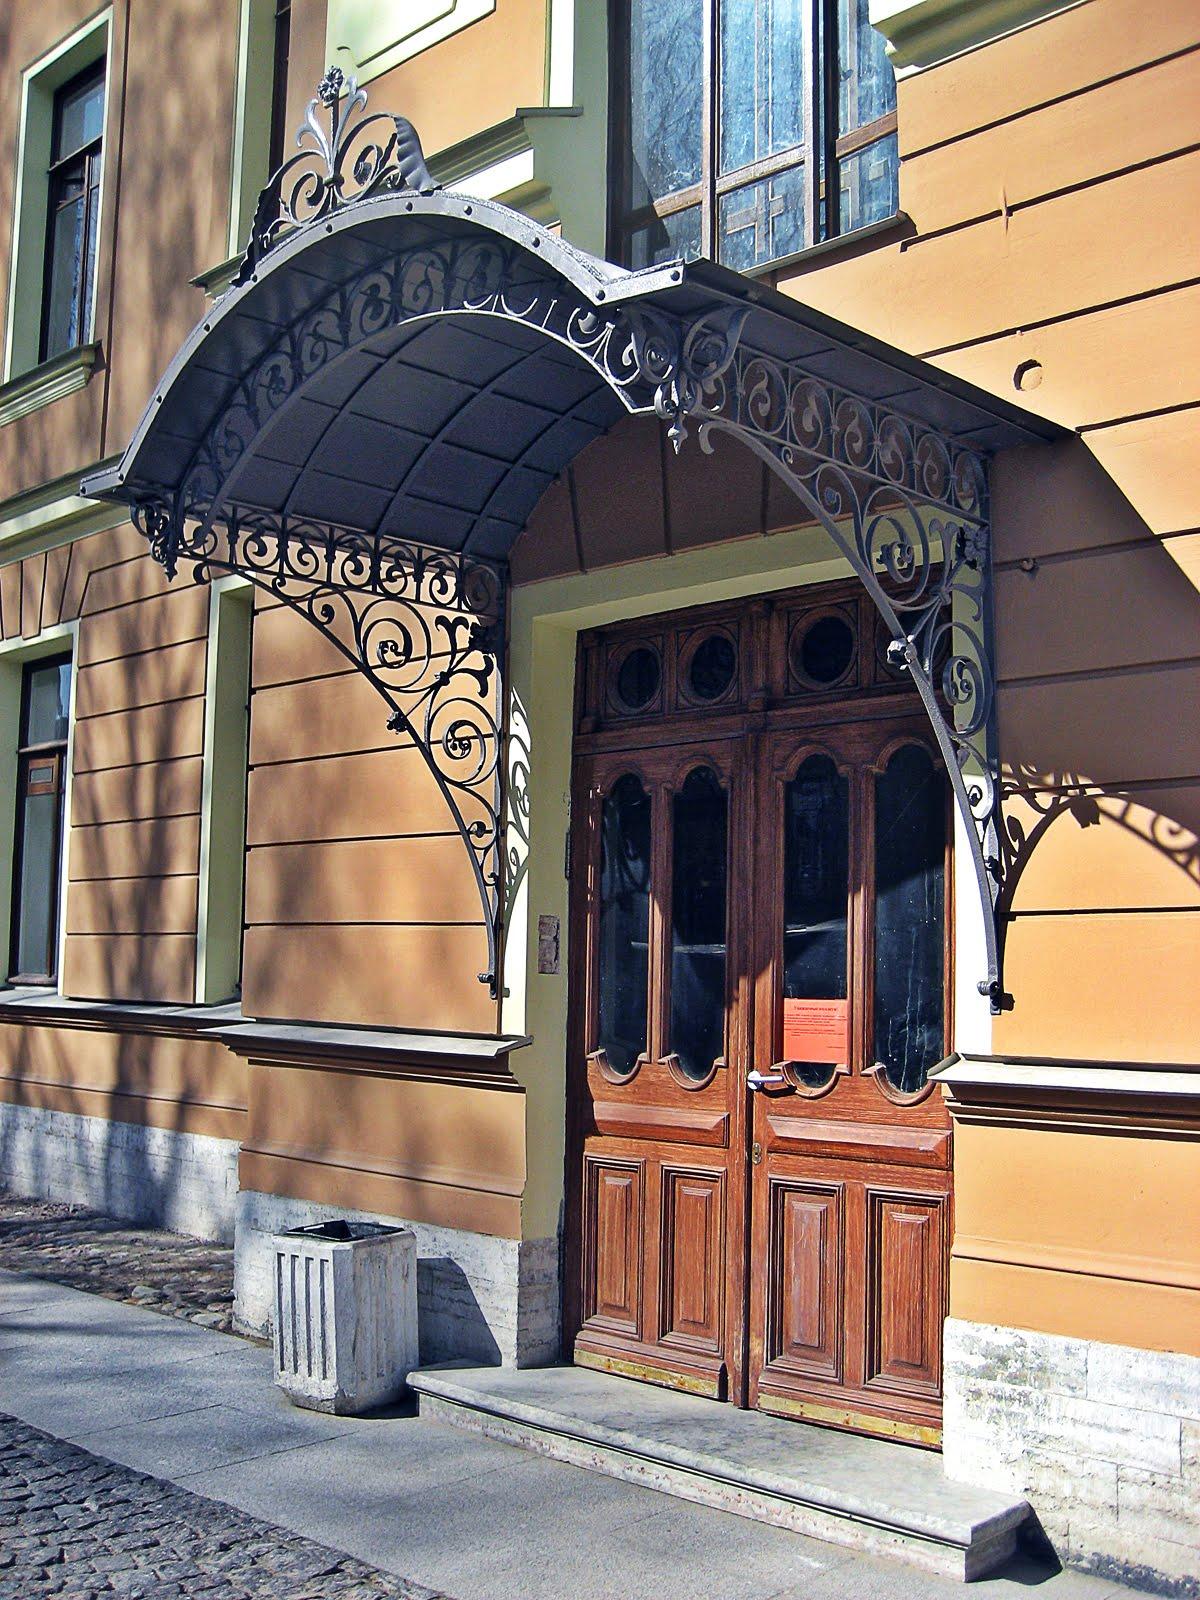 Vanguardias puertas ventanas y marquesinas for Marquesinas para puertas